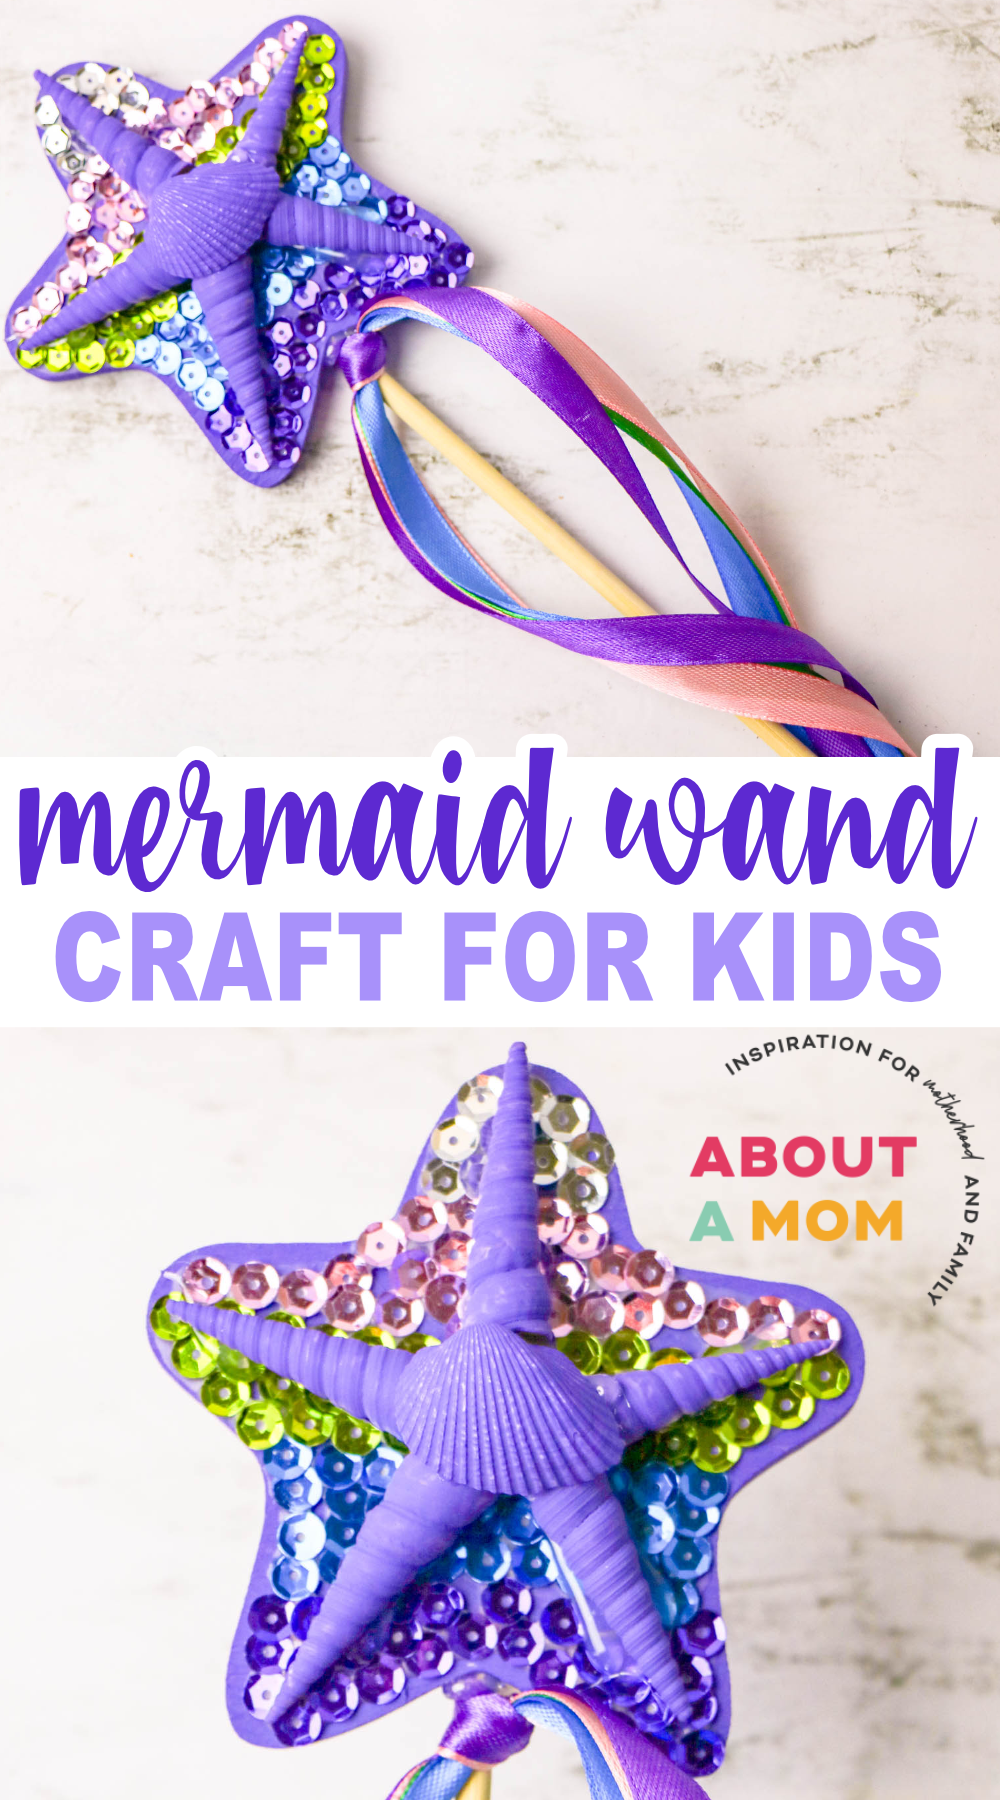 DIY Mermaid Wand Craft for Kids